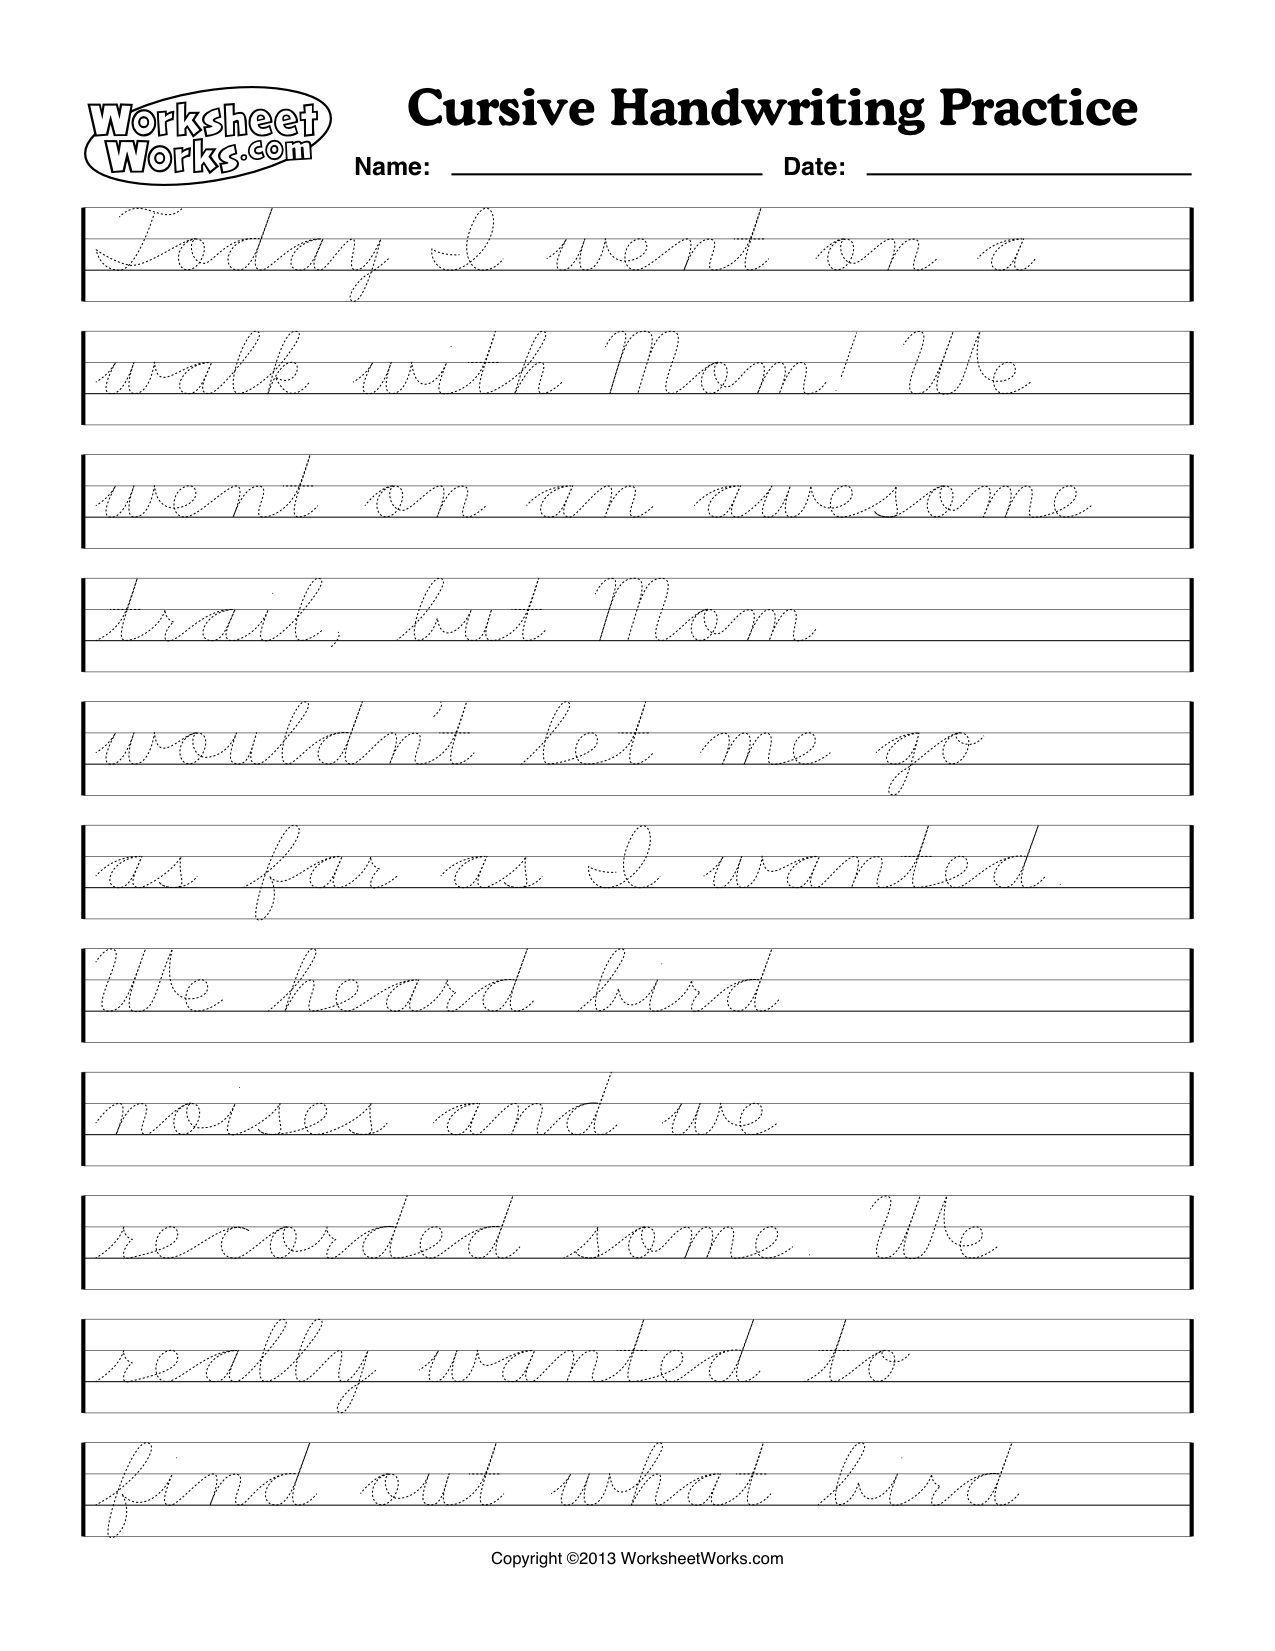 Handwriting Practice Worksheets For Download Handwriting